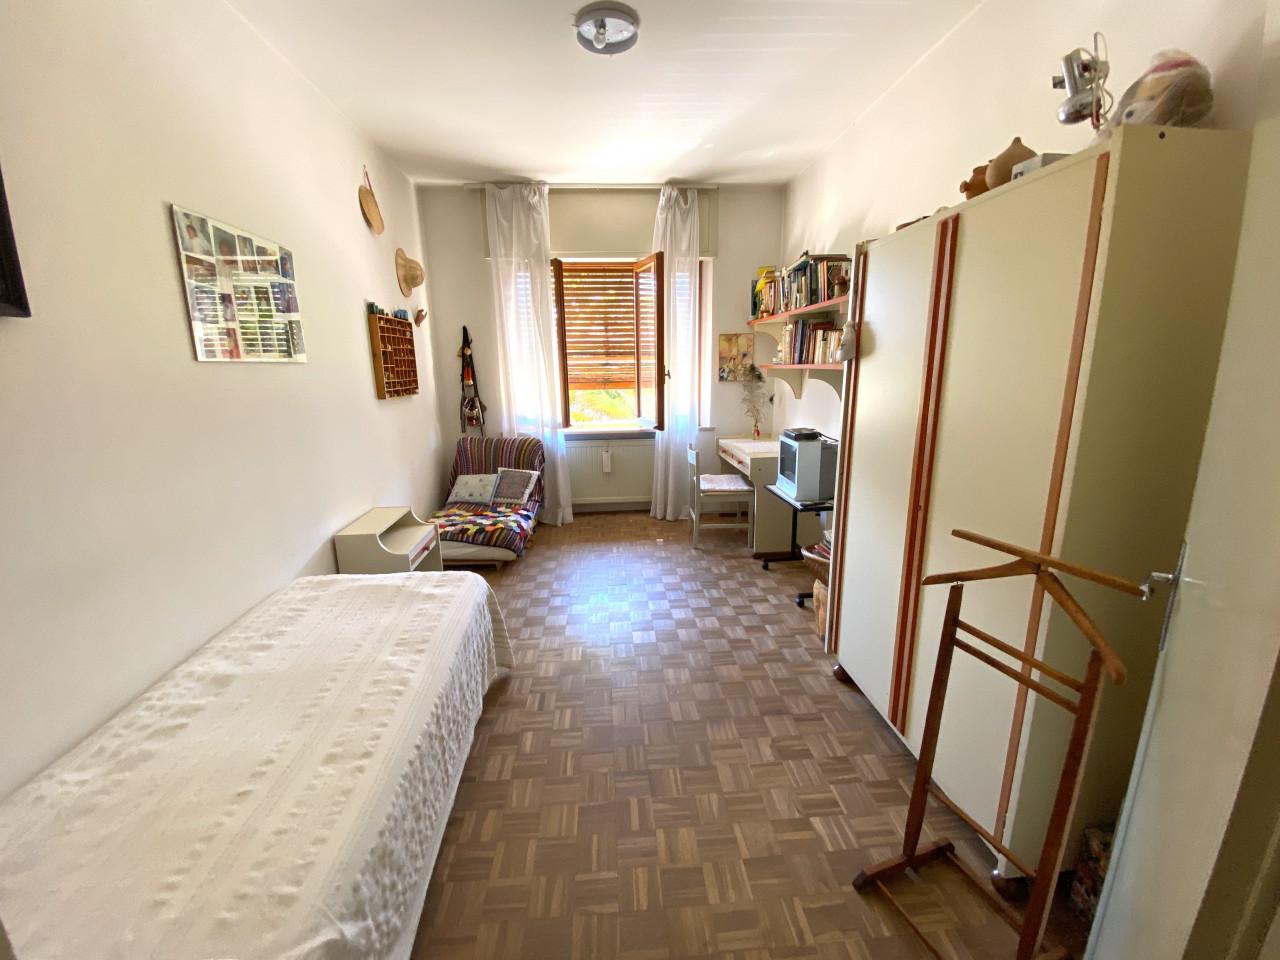 Casa singola con capannone in vendita in centro a Budoia - Rif. V.D.1 https://images.gestionaleimmobiliare.it/foto/annunci/200702/2265893/1280x1280/011__img_2981.jpg